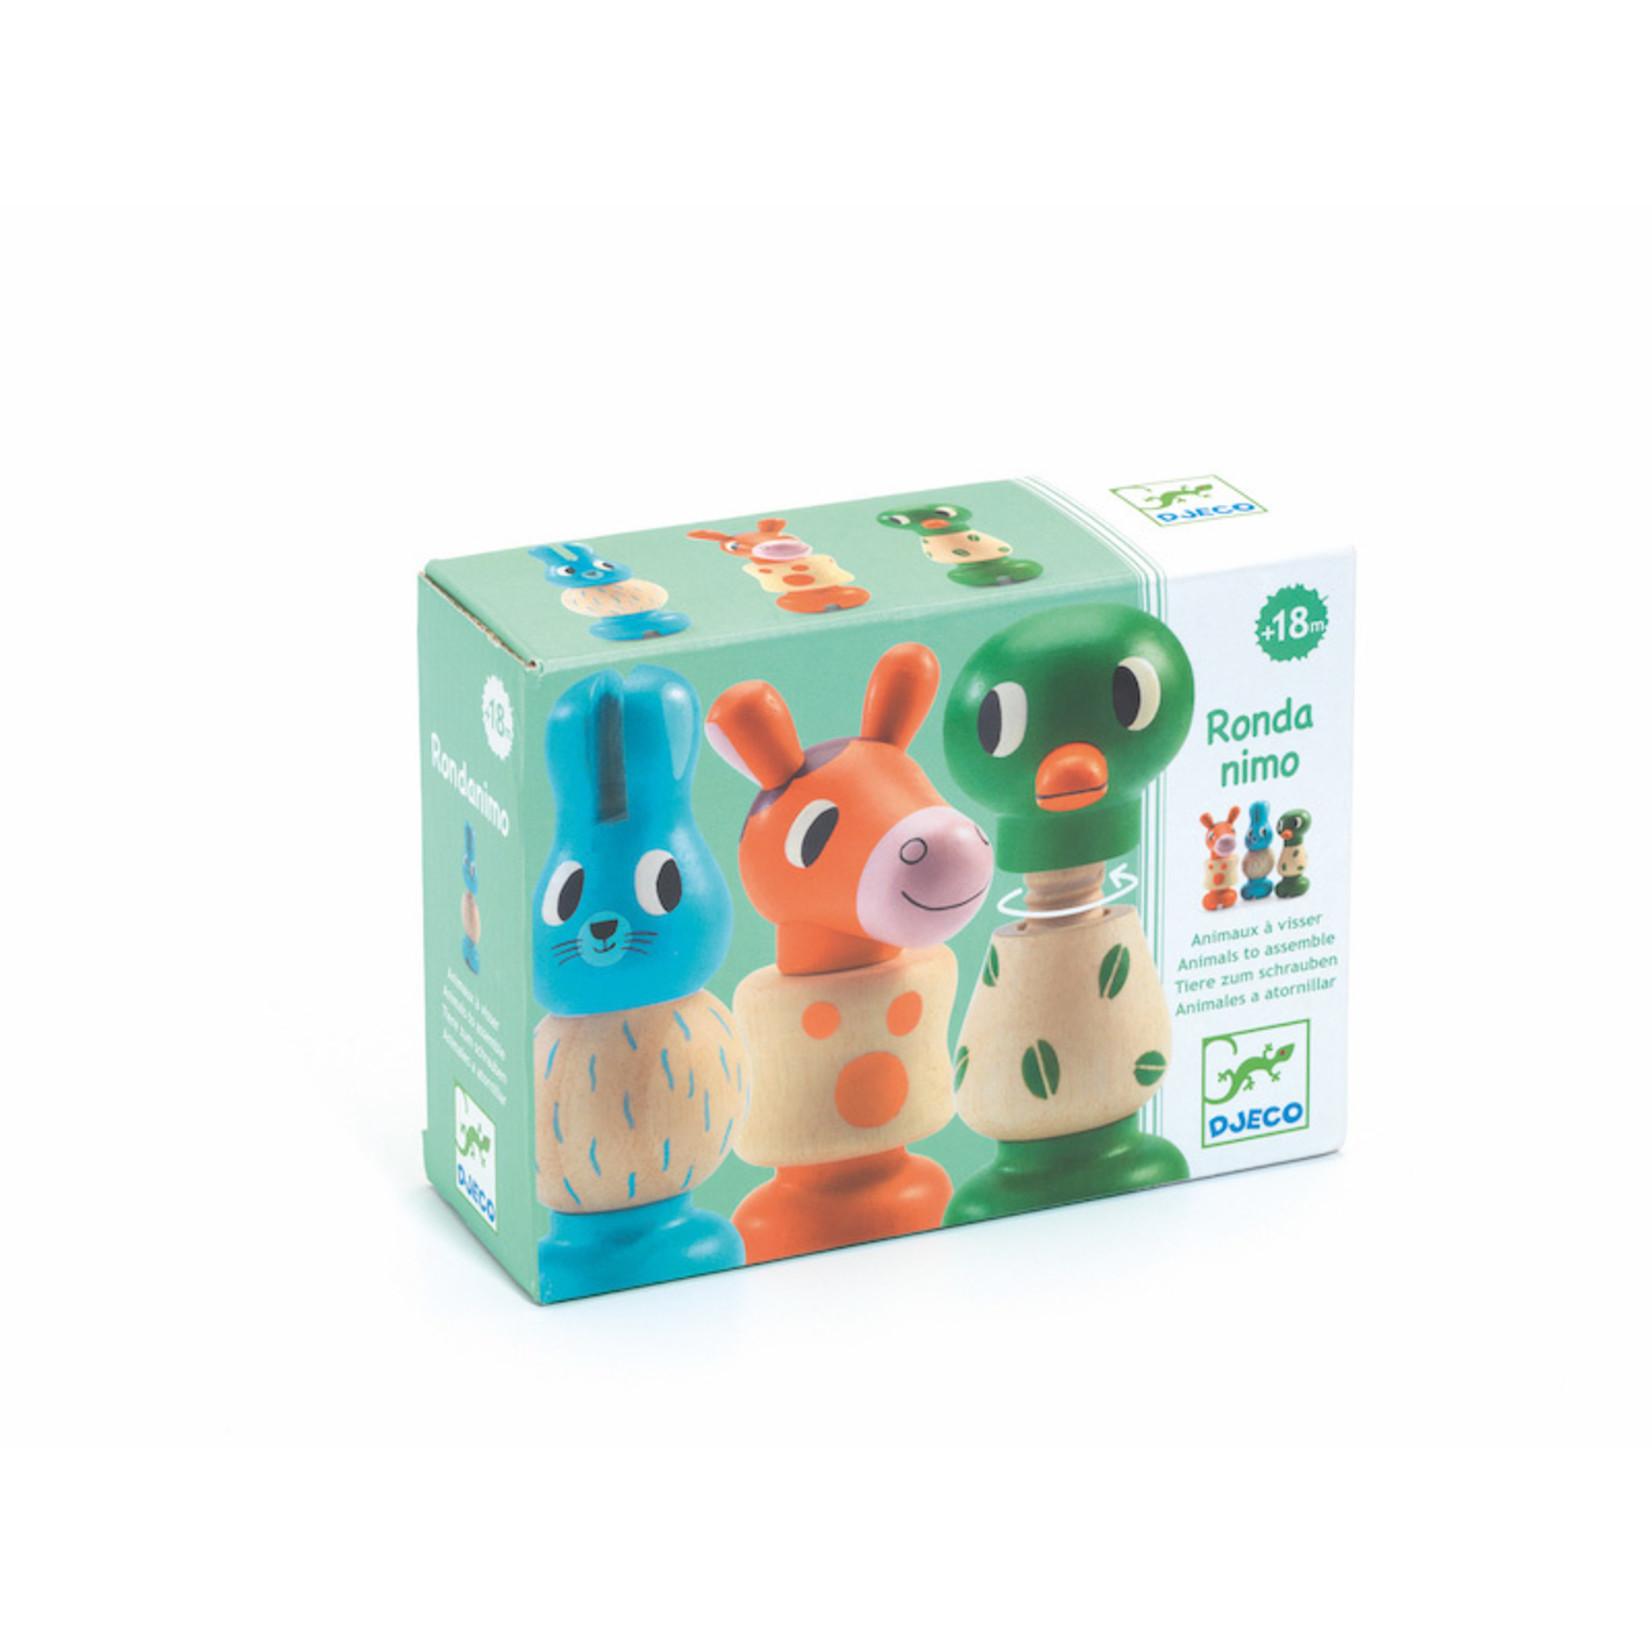 Djeco Rond Animo Animal Figure Puzzle